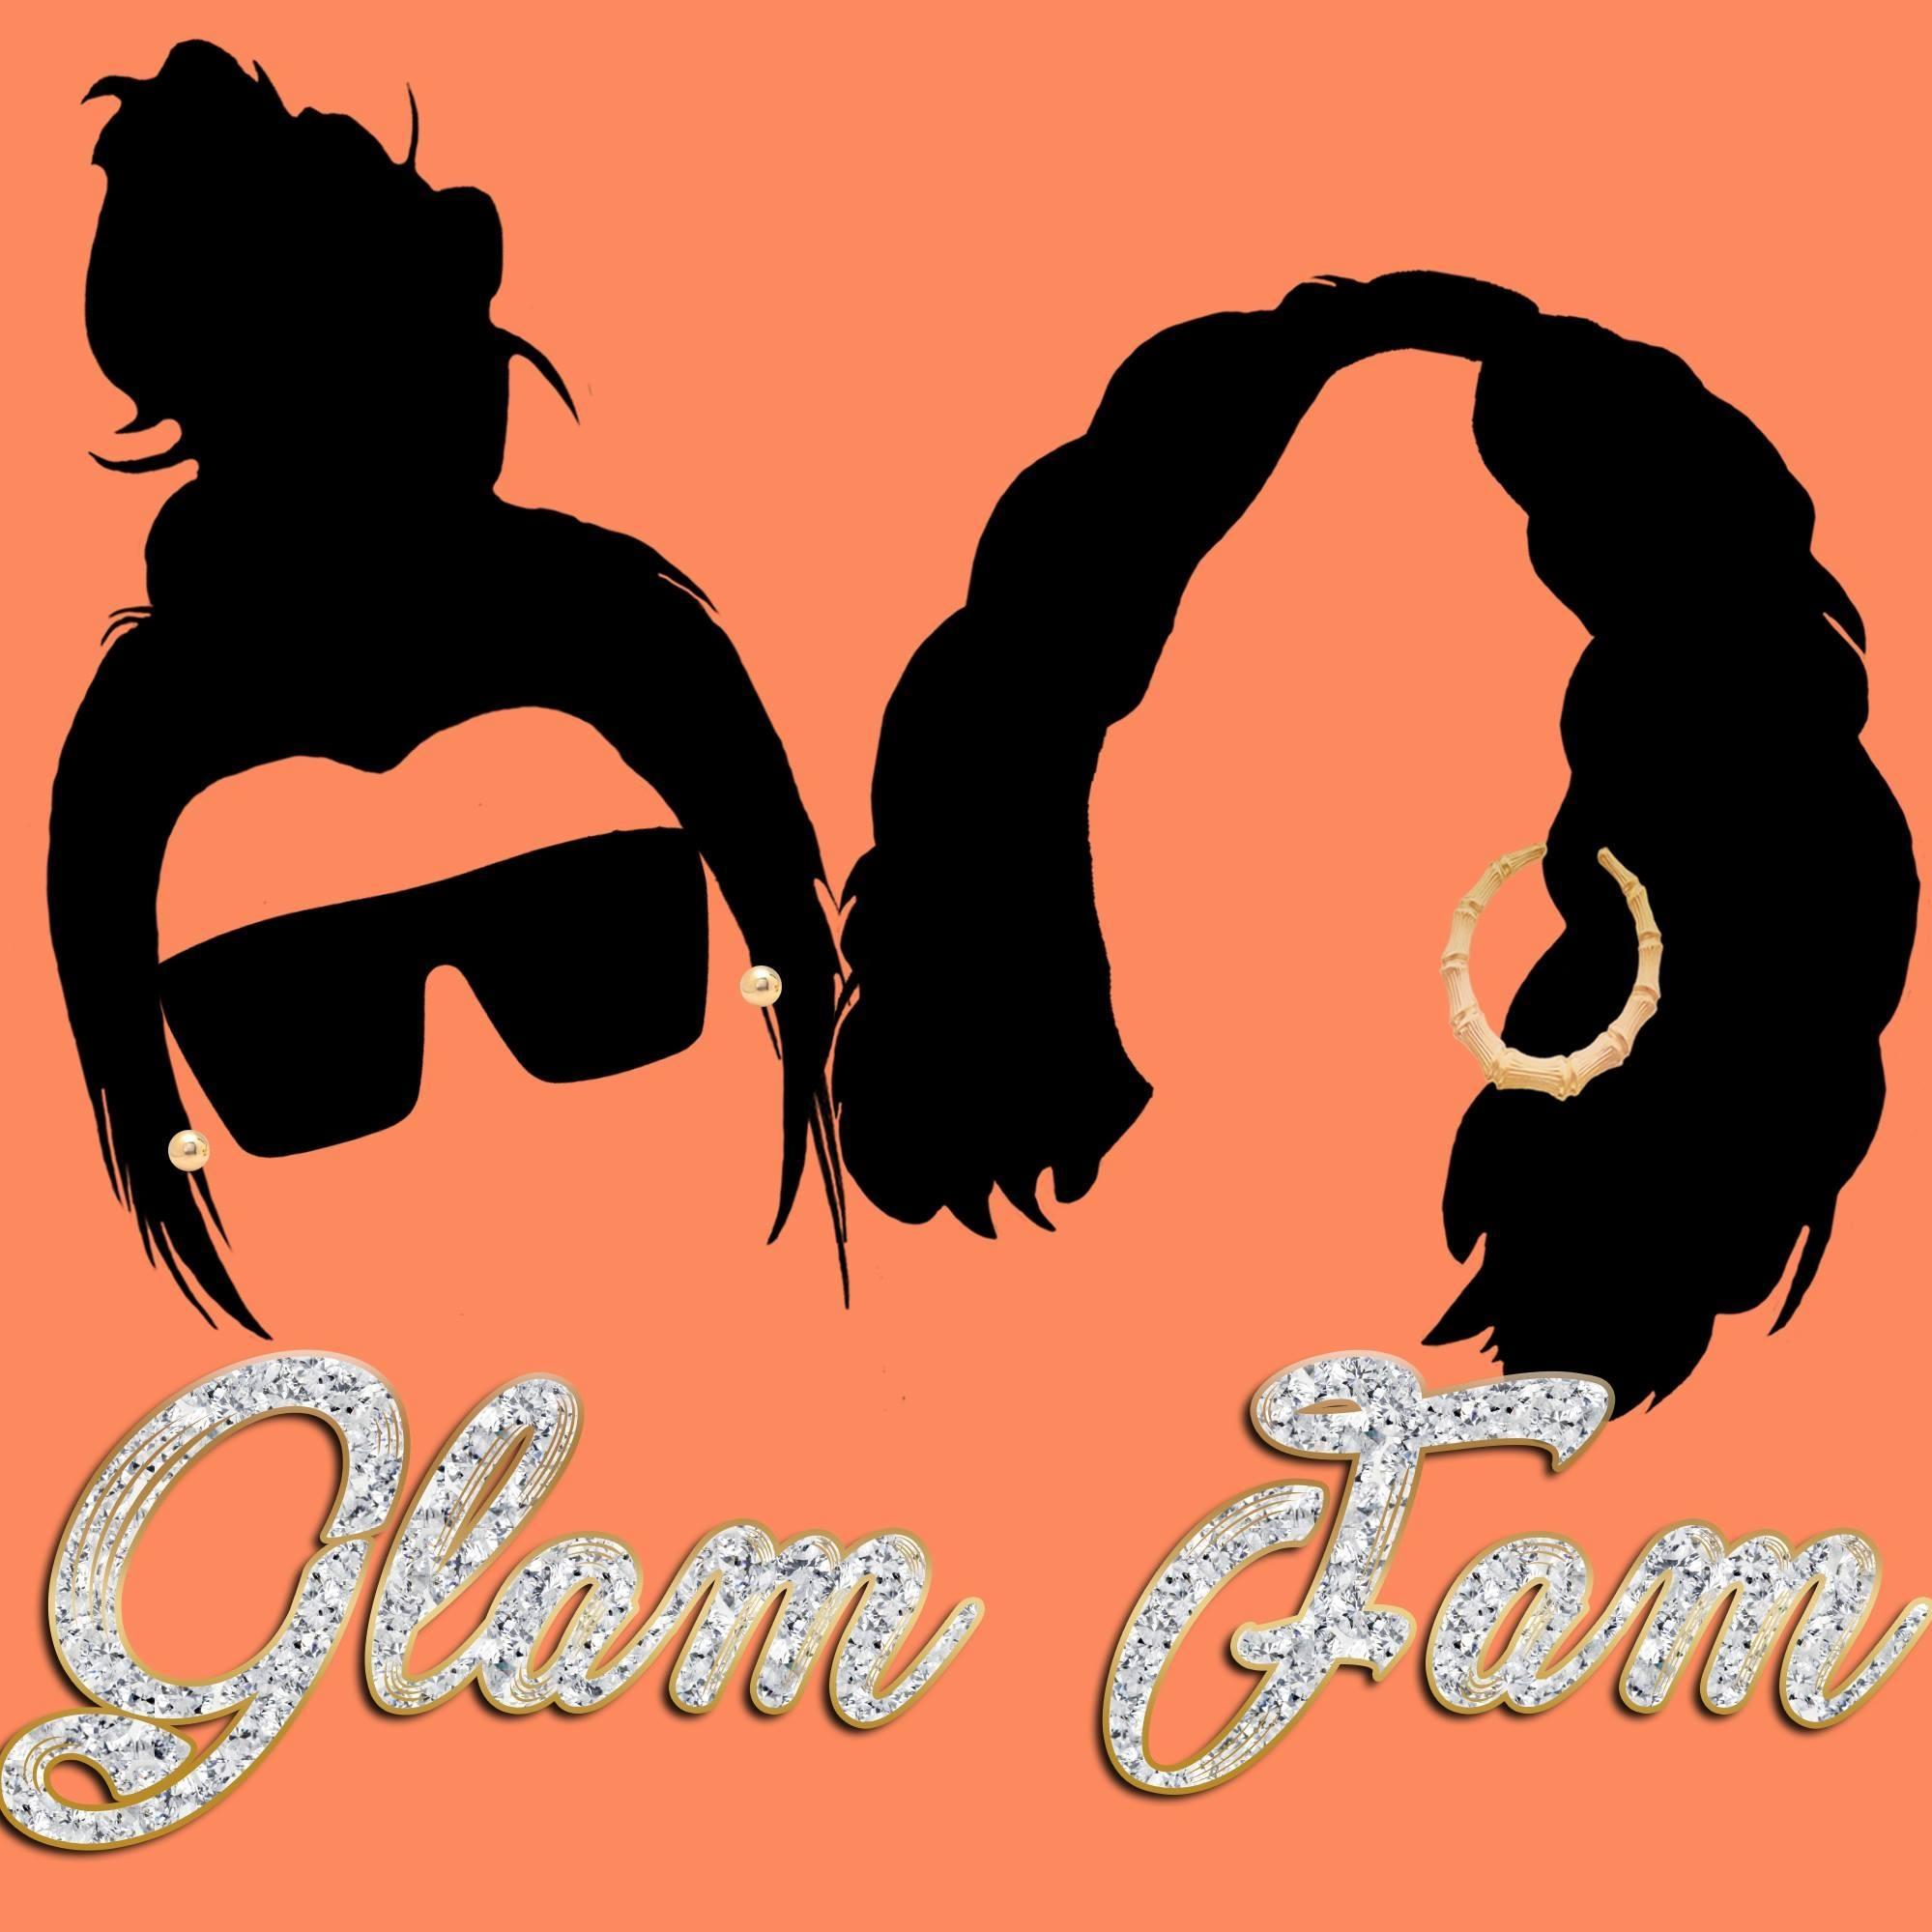 Glam Fam